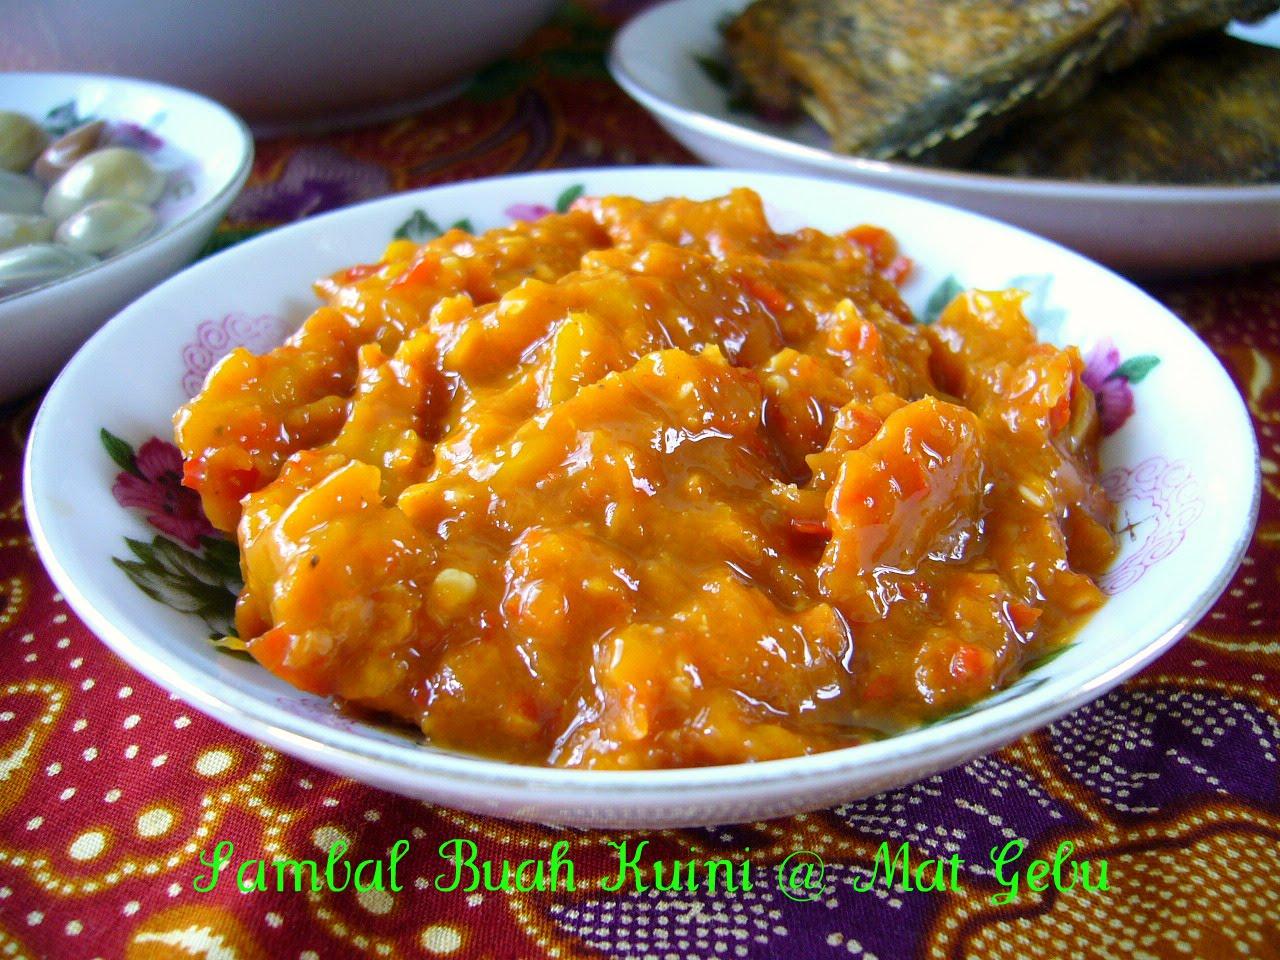 Resepi Masakan Kampung Resipi Masakan Kampung